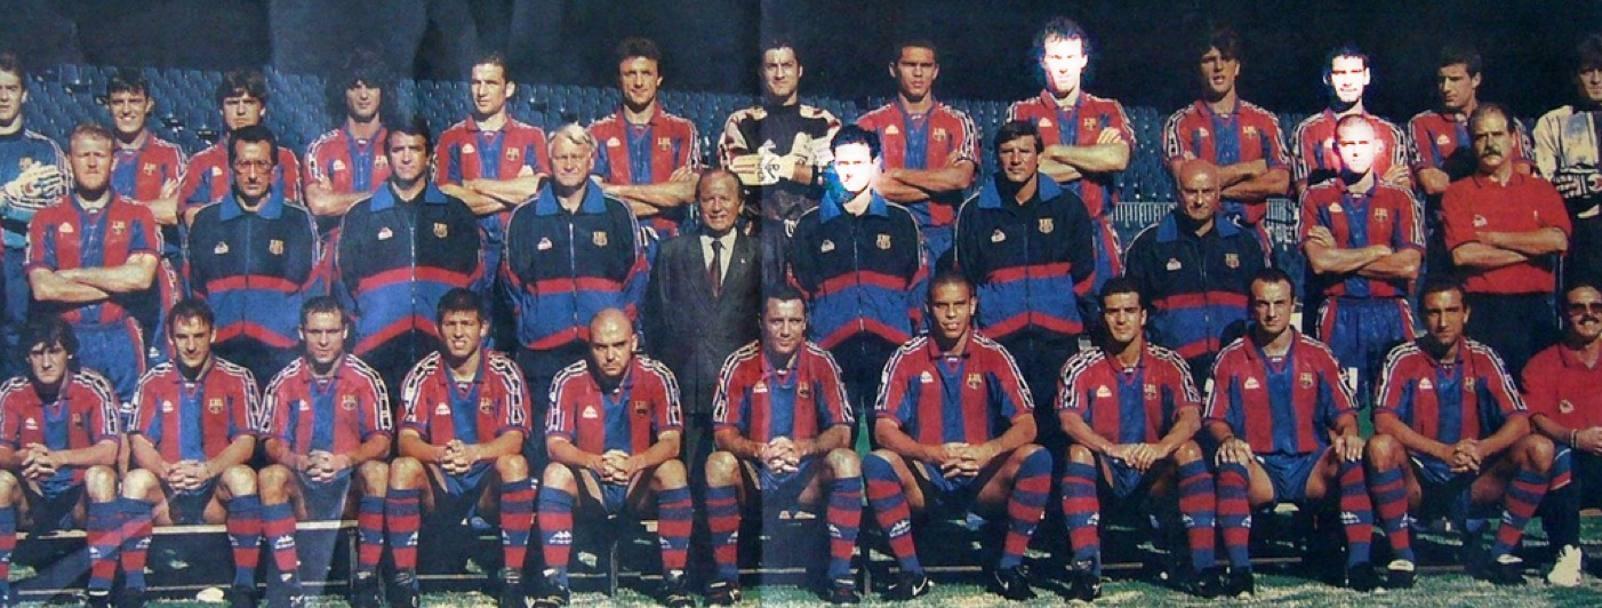 Состав команды барселона 1996 года